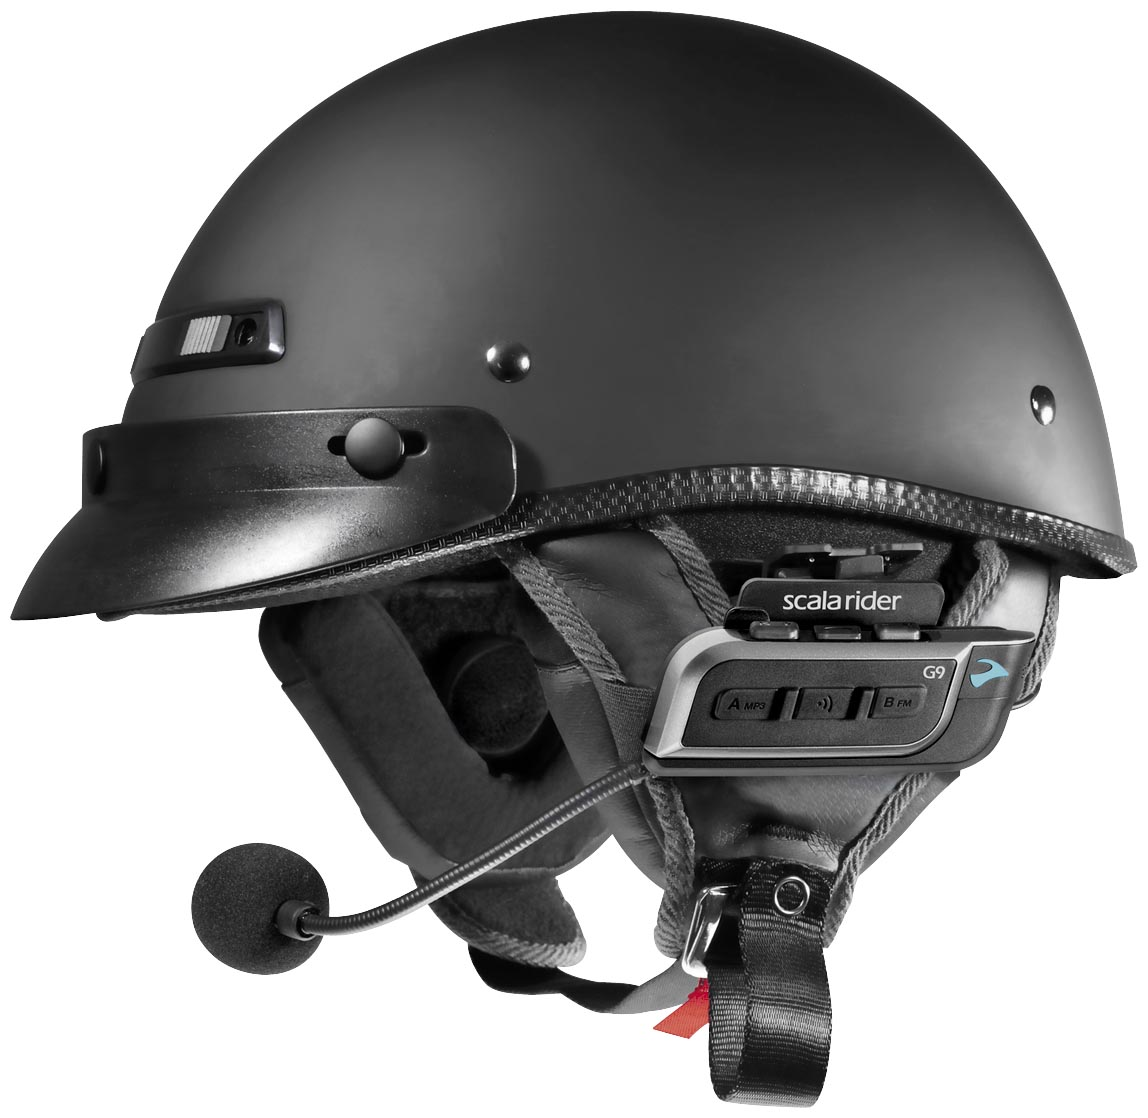 Scala Rider Scala Rider Half Helmet Audio Kit for G9 Headset